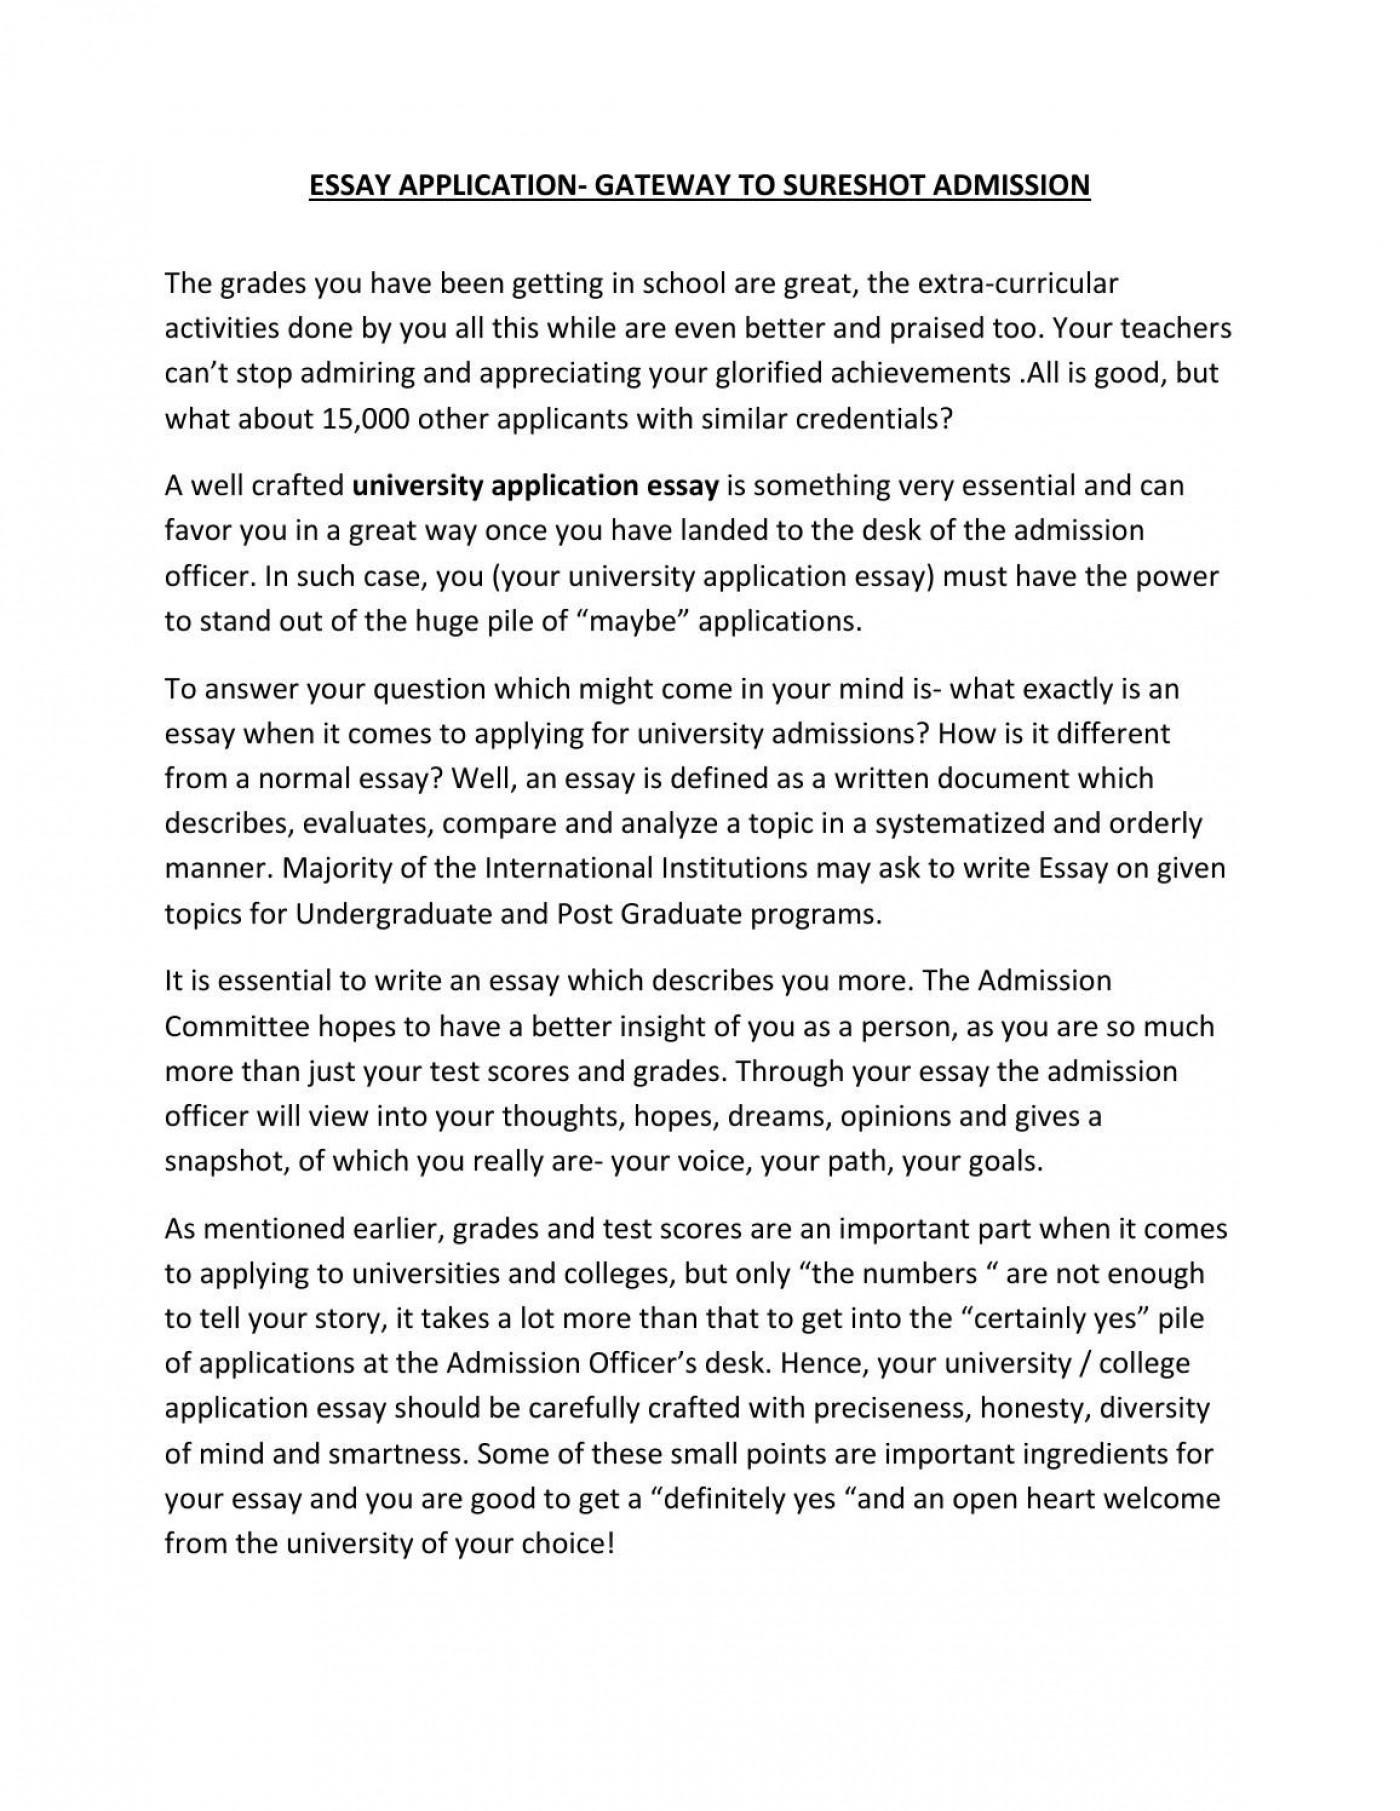 Thesis statement advantages using internet